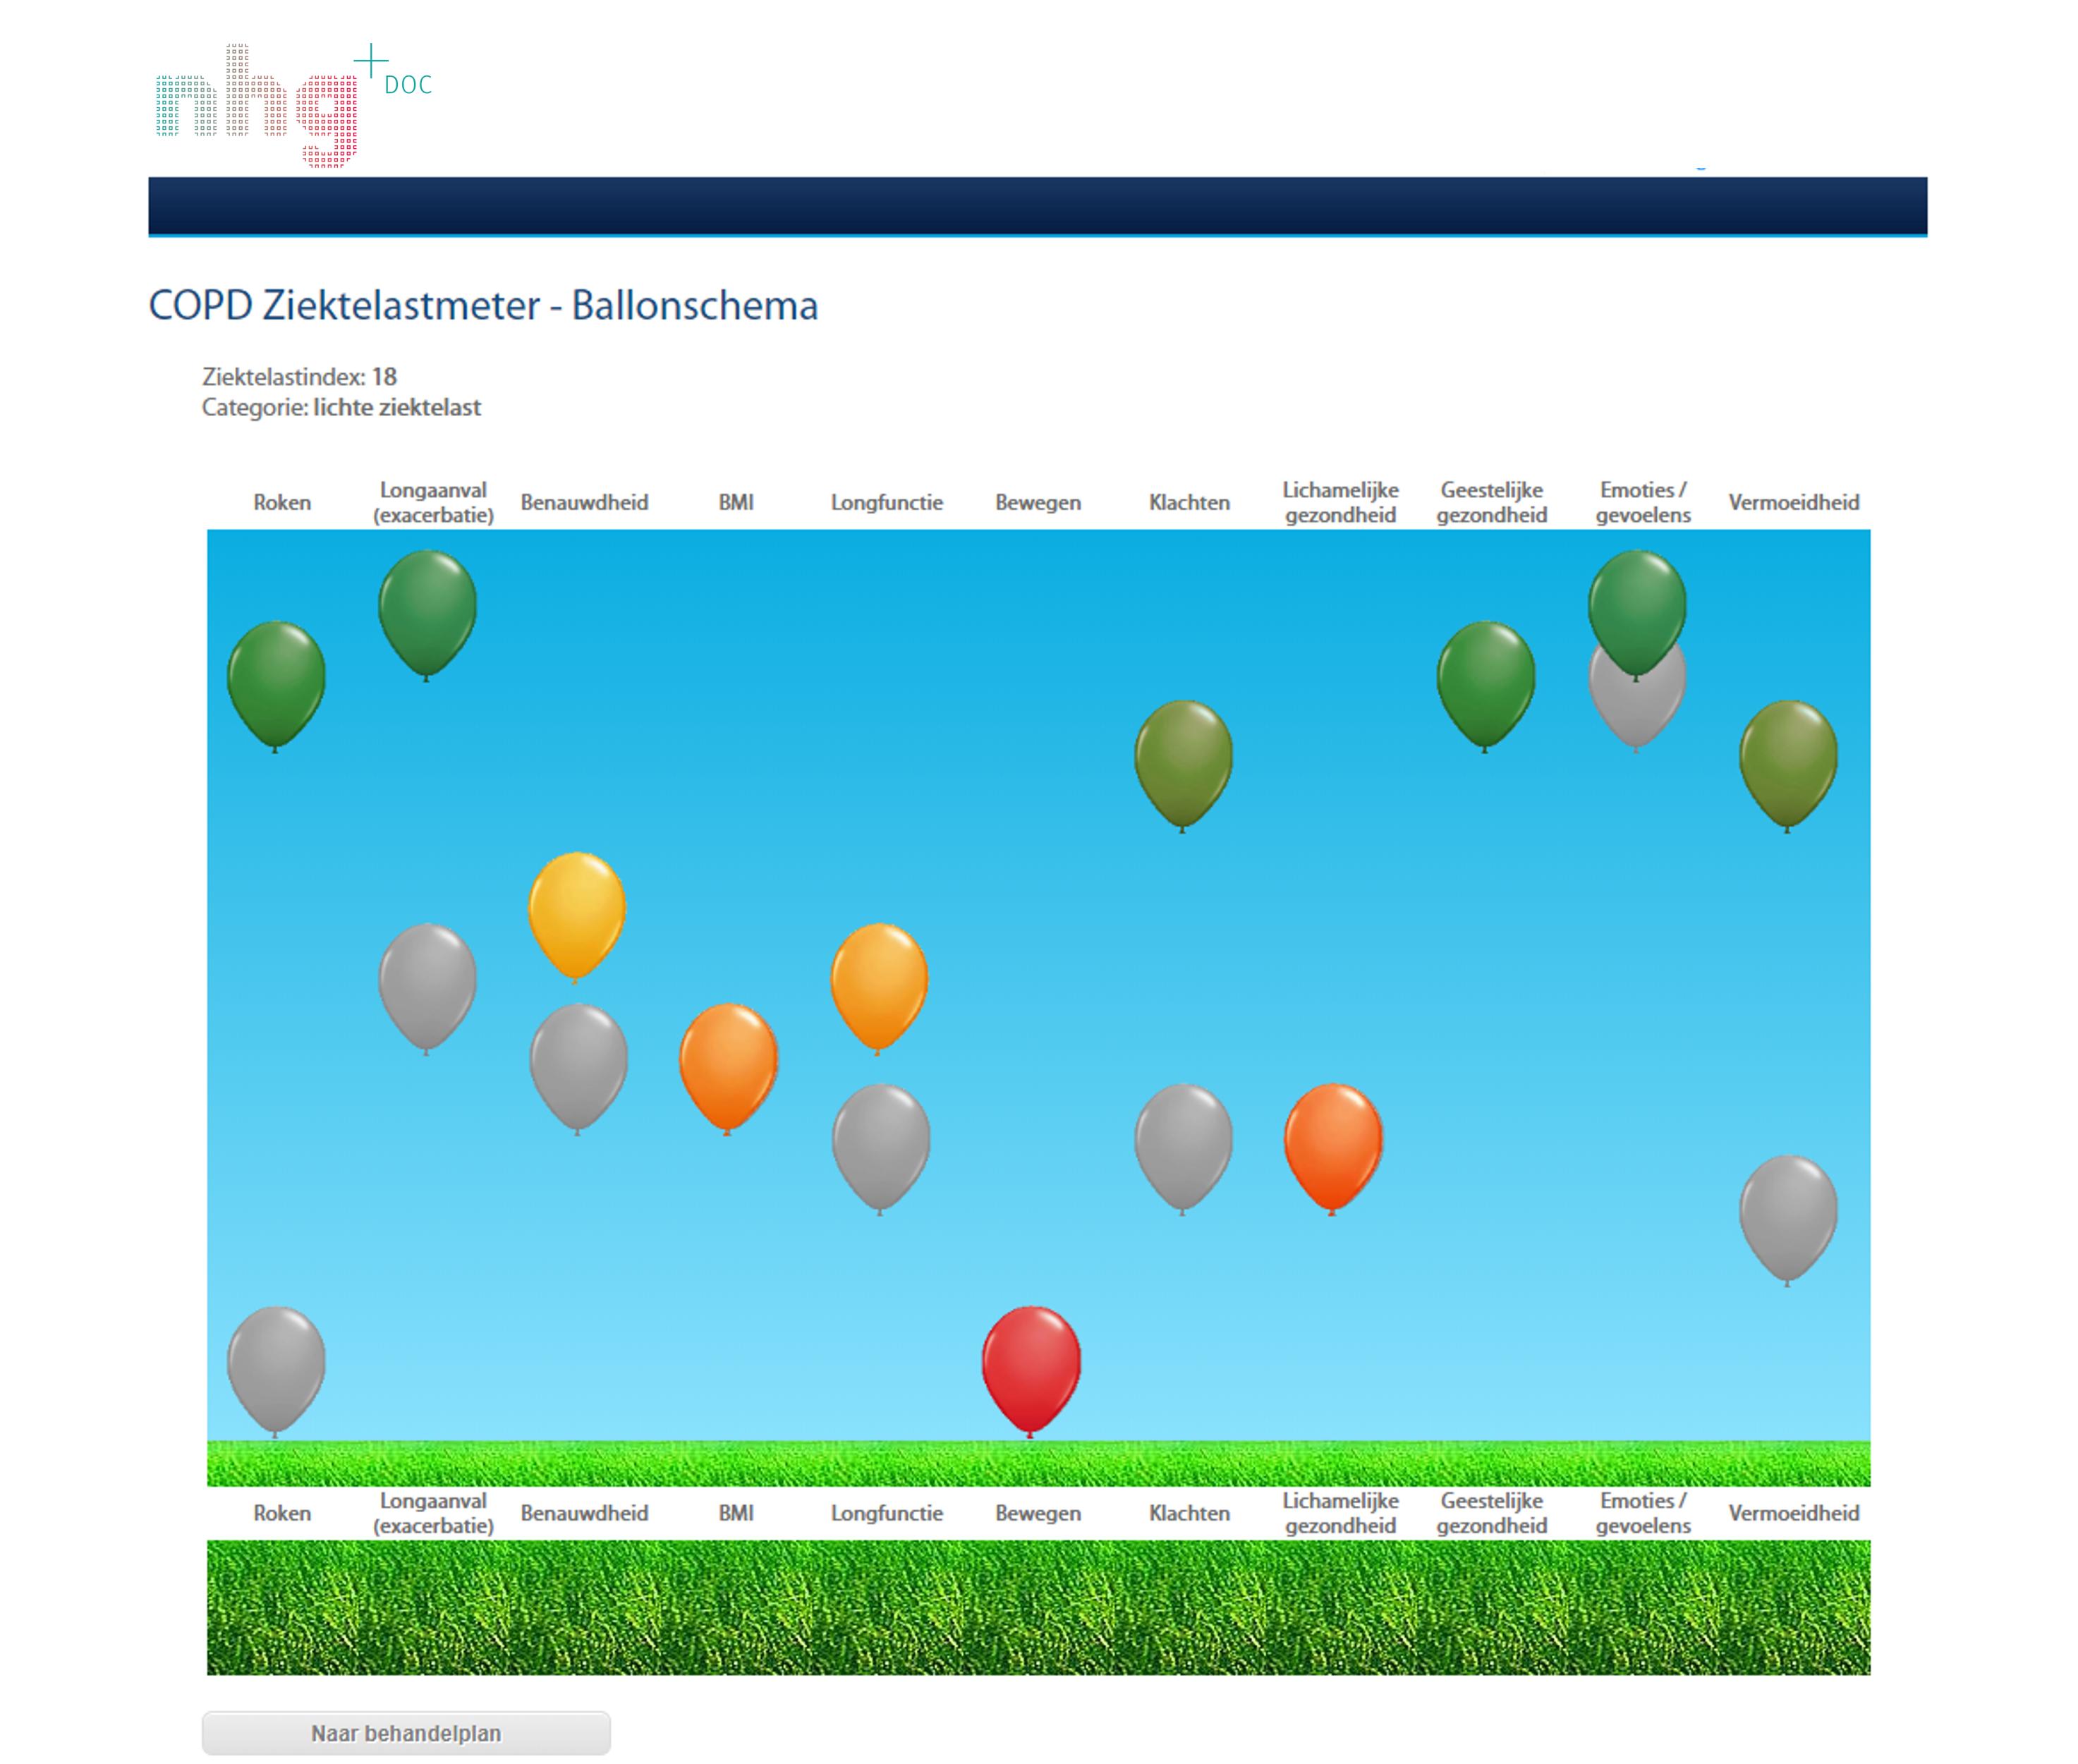 Ballonschema COPD ziektelastmeter in NHGDoc